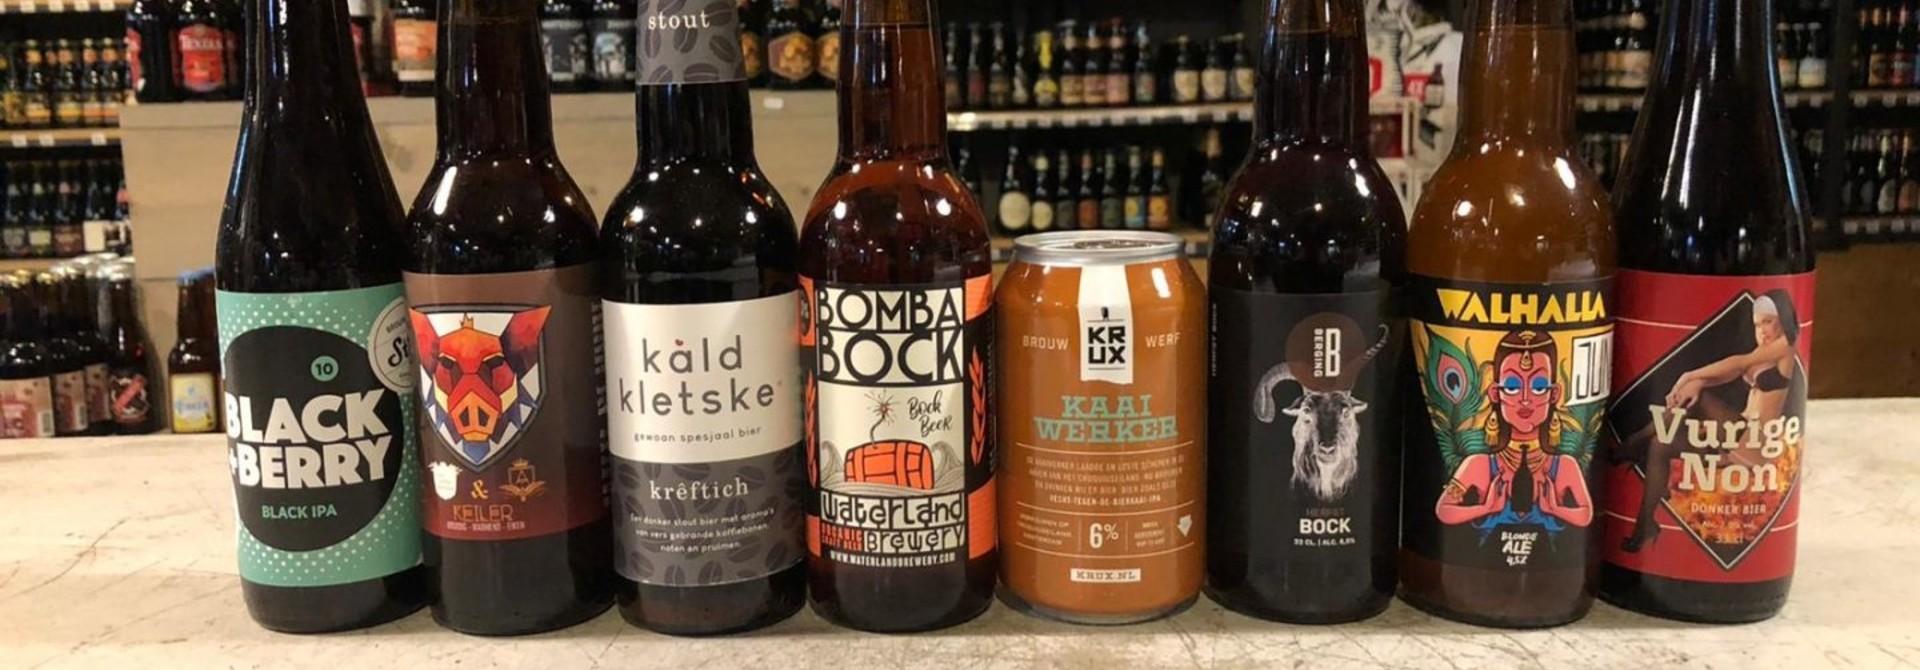 Speciaalbier – bierpakket november 2020